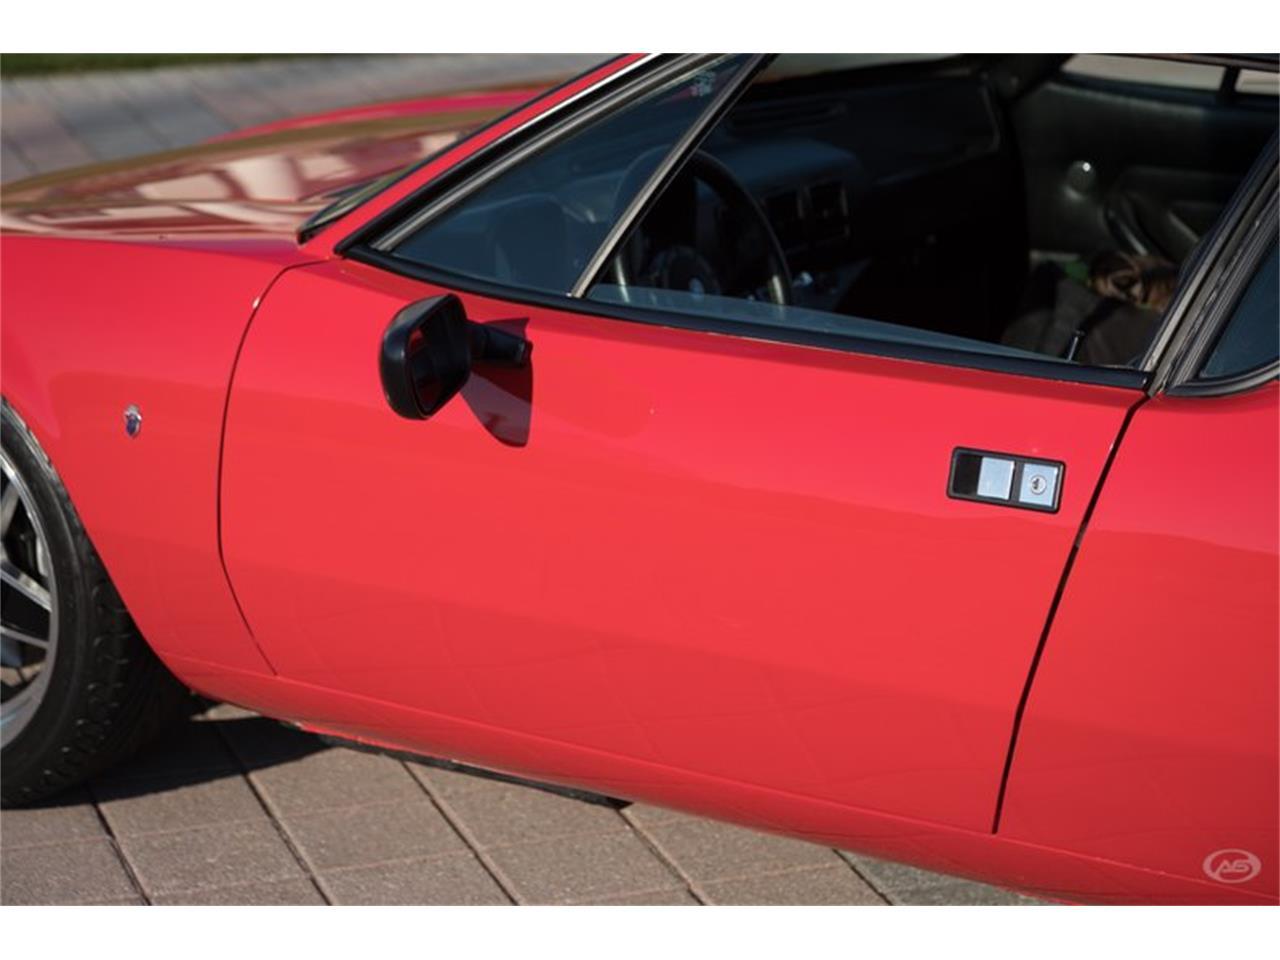 1971 De Tomaso Pantera (CC-1082737) for sale in Collierville, Tennessee